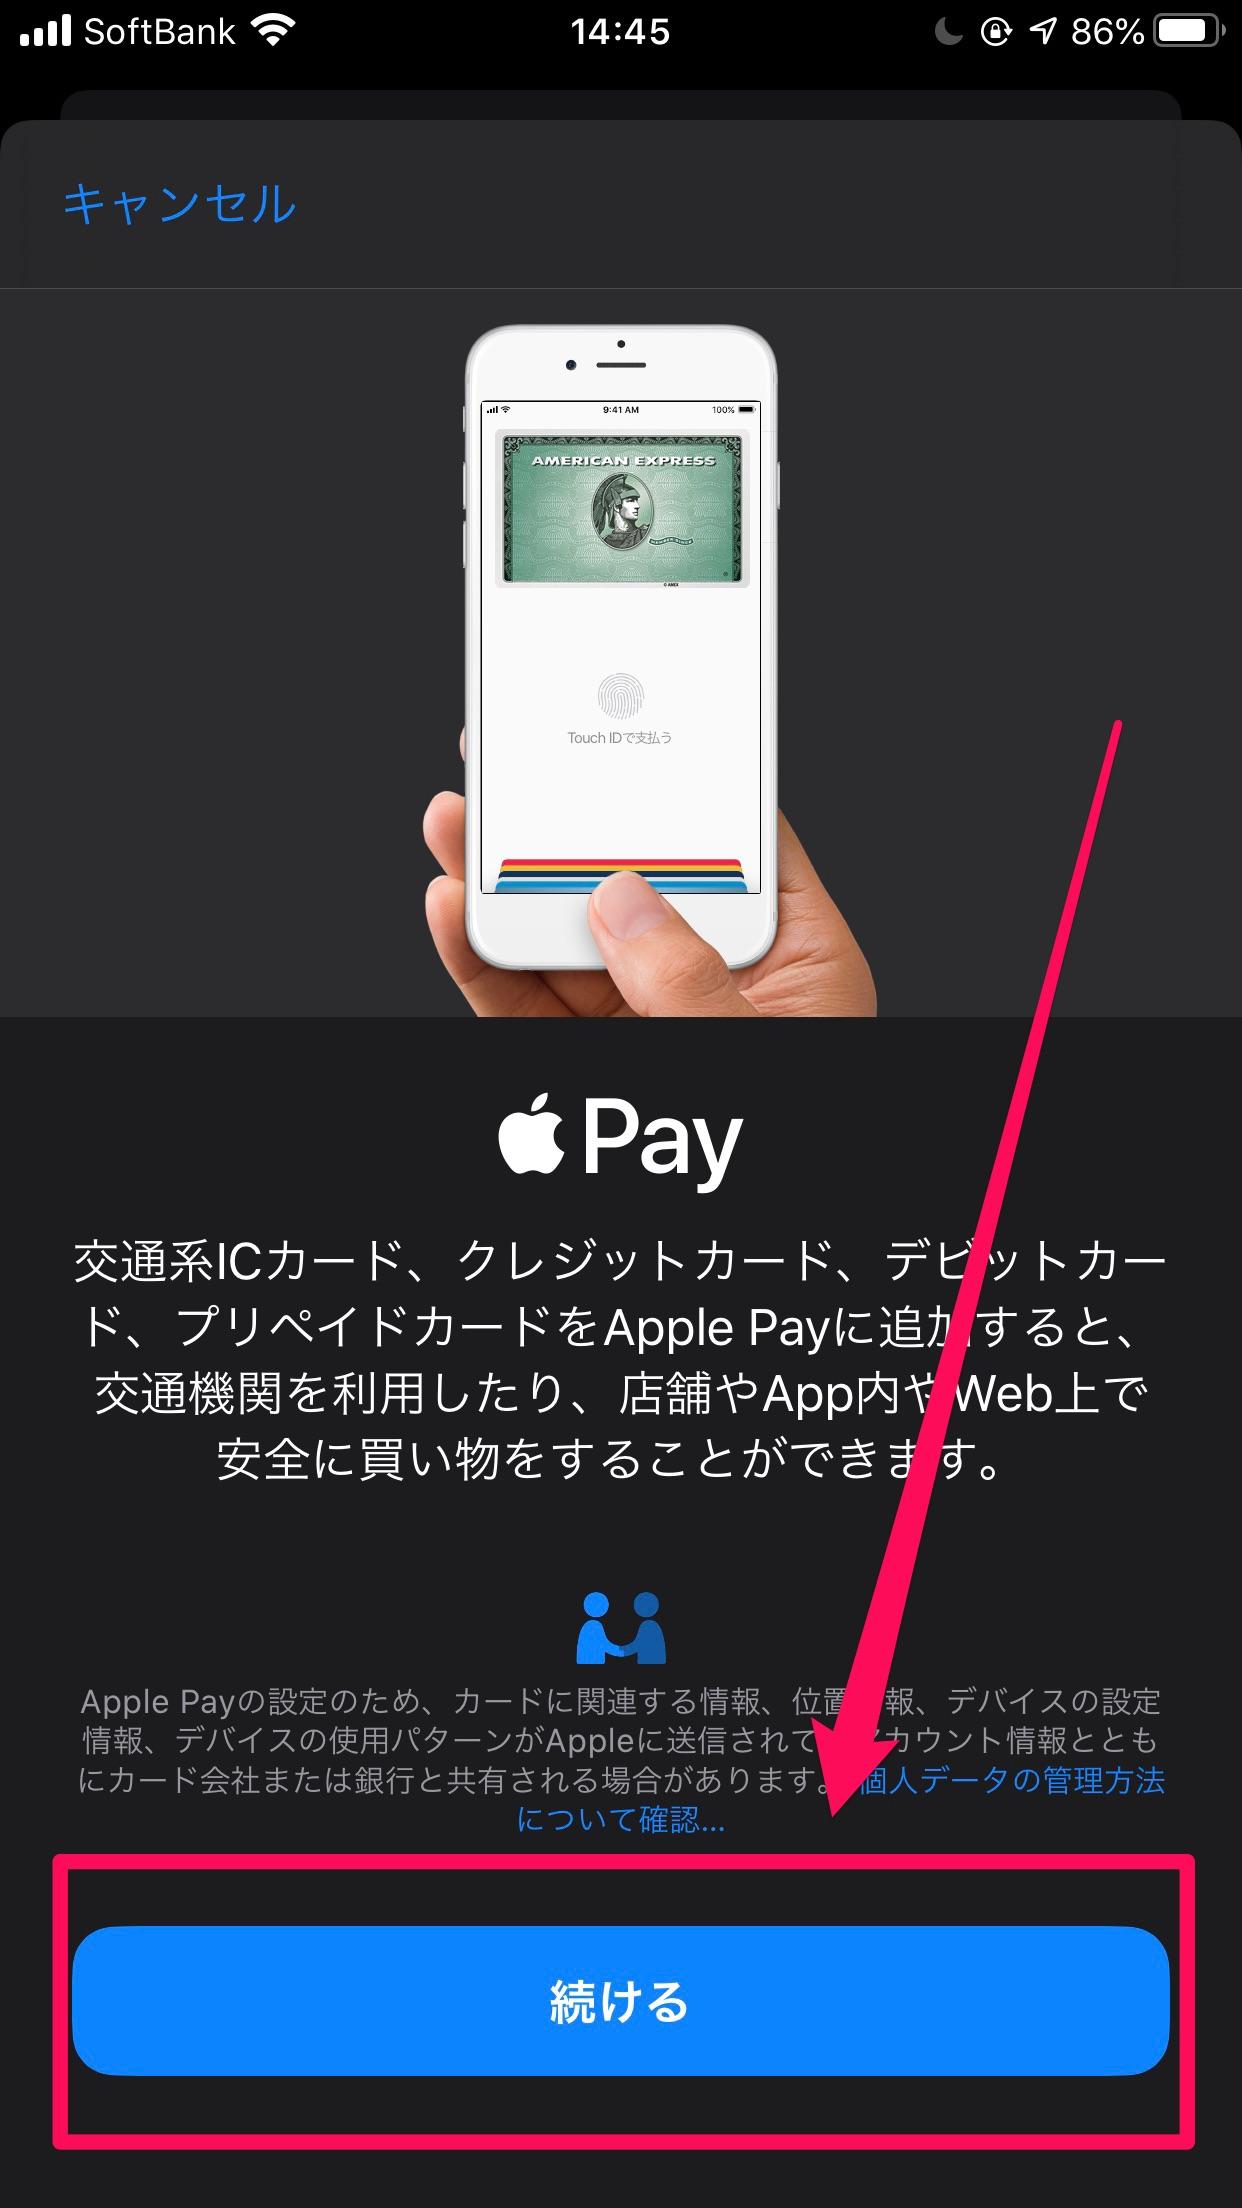 Apple PayでSuica9